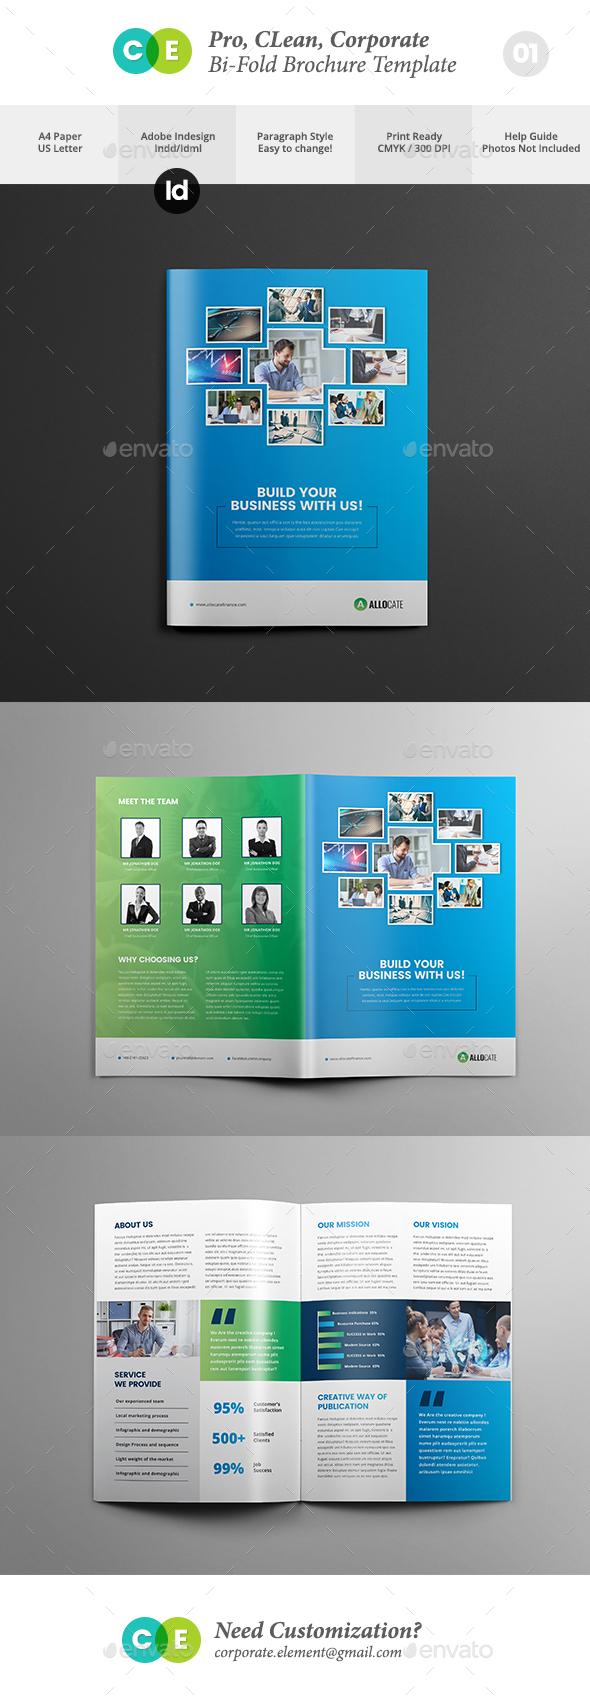 Clean Pro Bi-Fold Brochure Template V01 - Brochures Print Templates